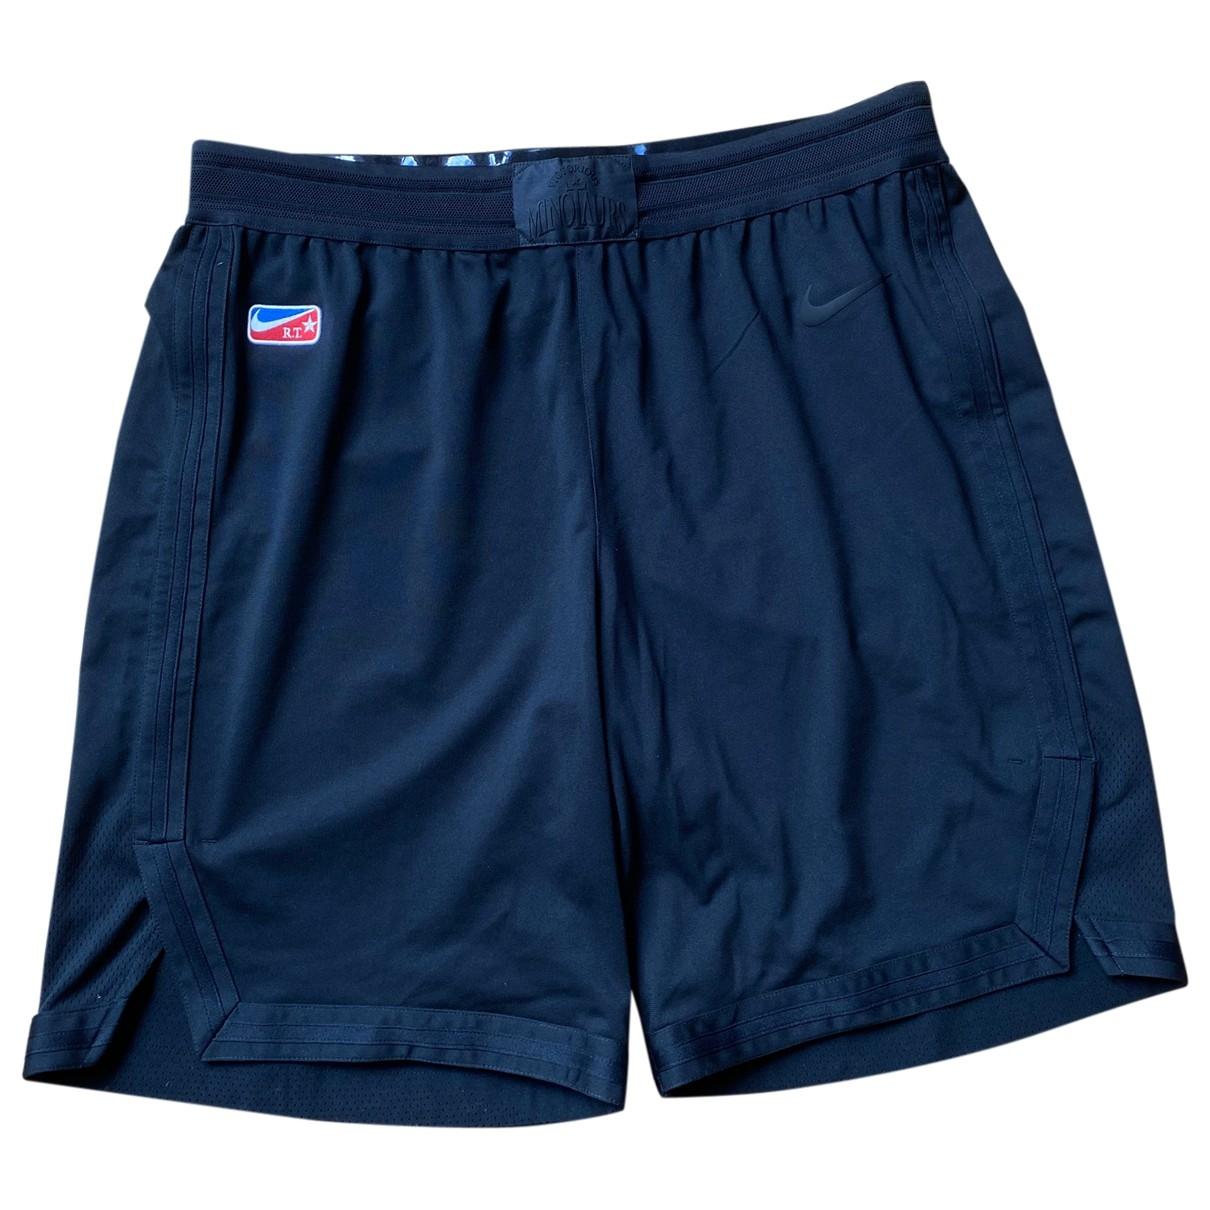 Pantalon corto Nike By Riccardo Tisci